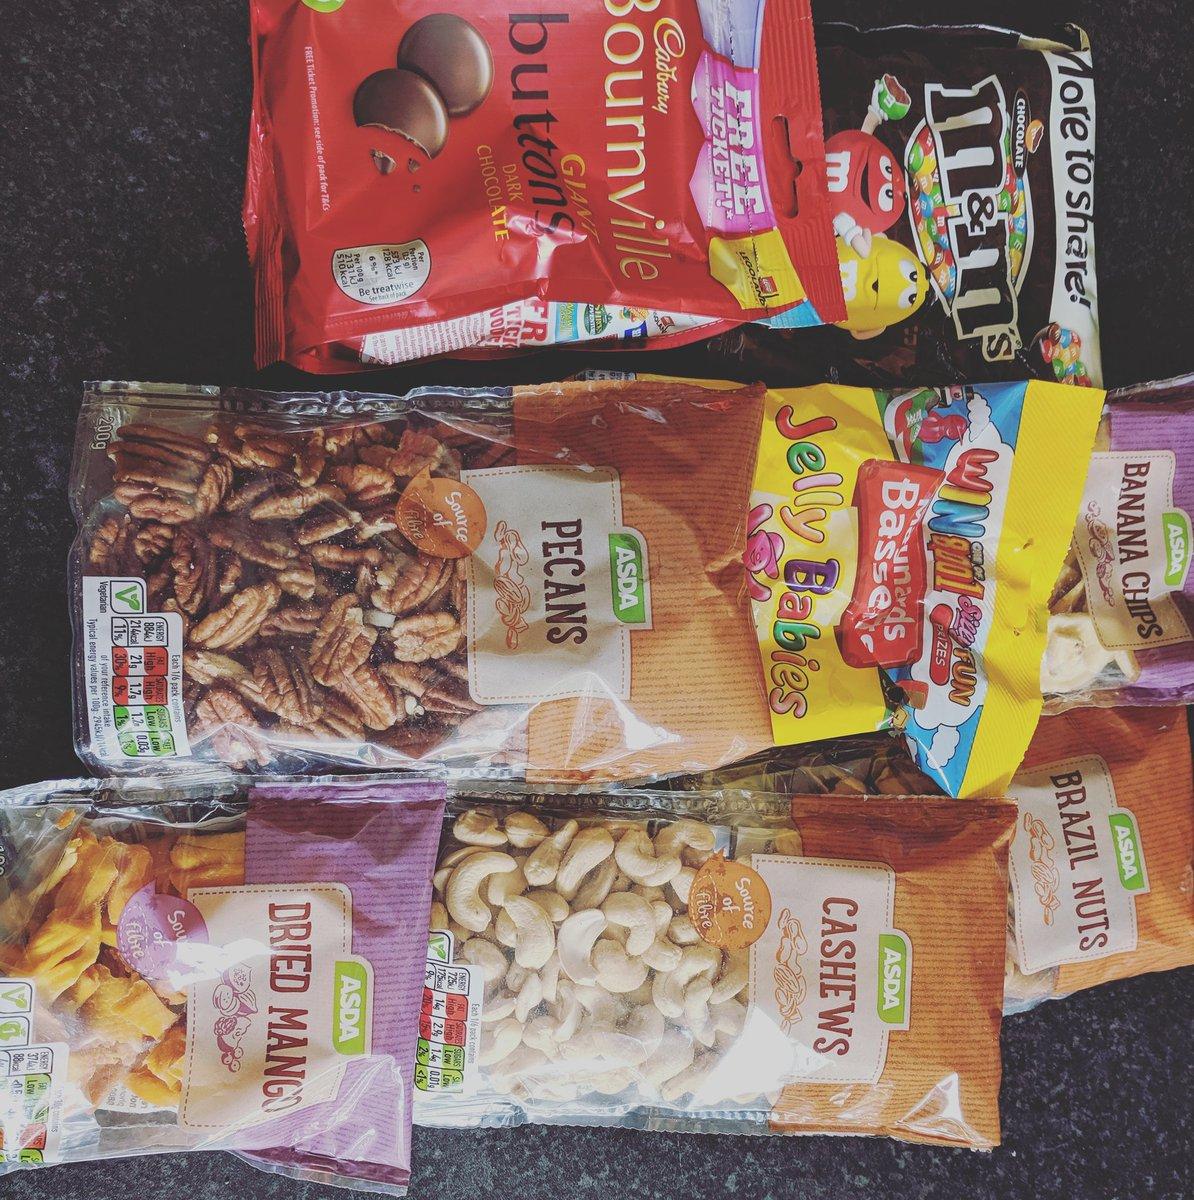 James Boulter On Twitter I Tend To Just Stuff Random Food